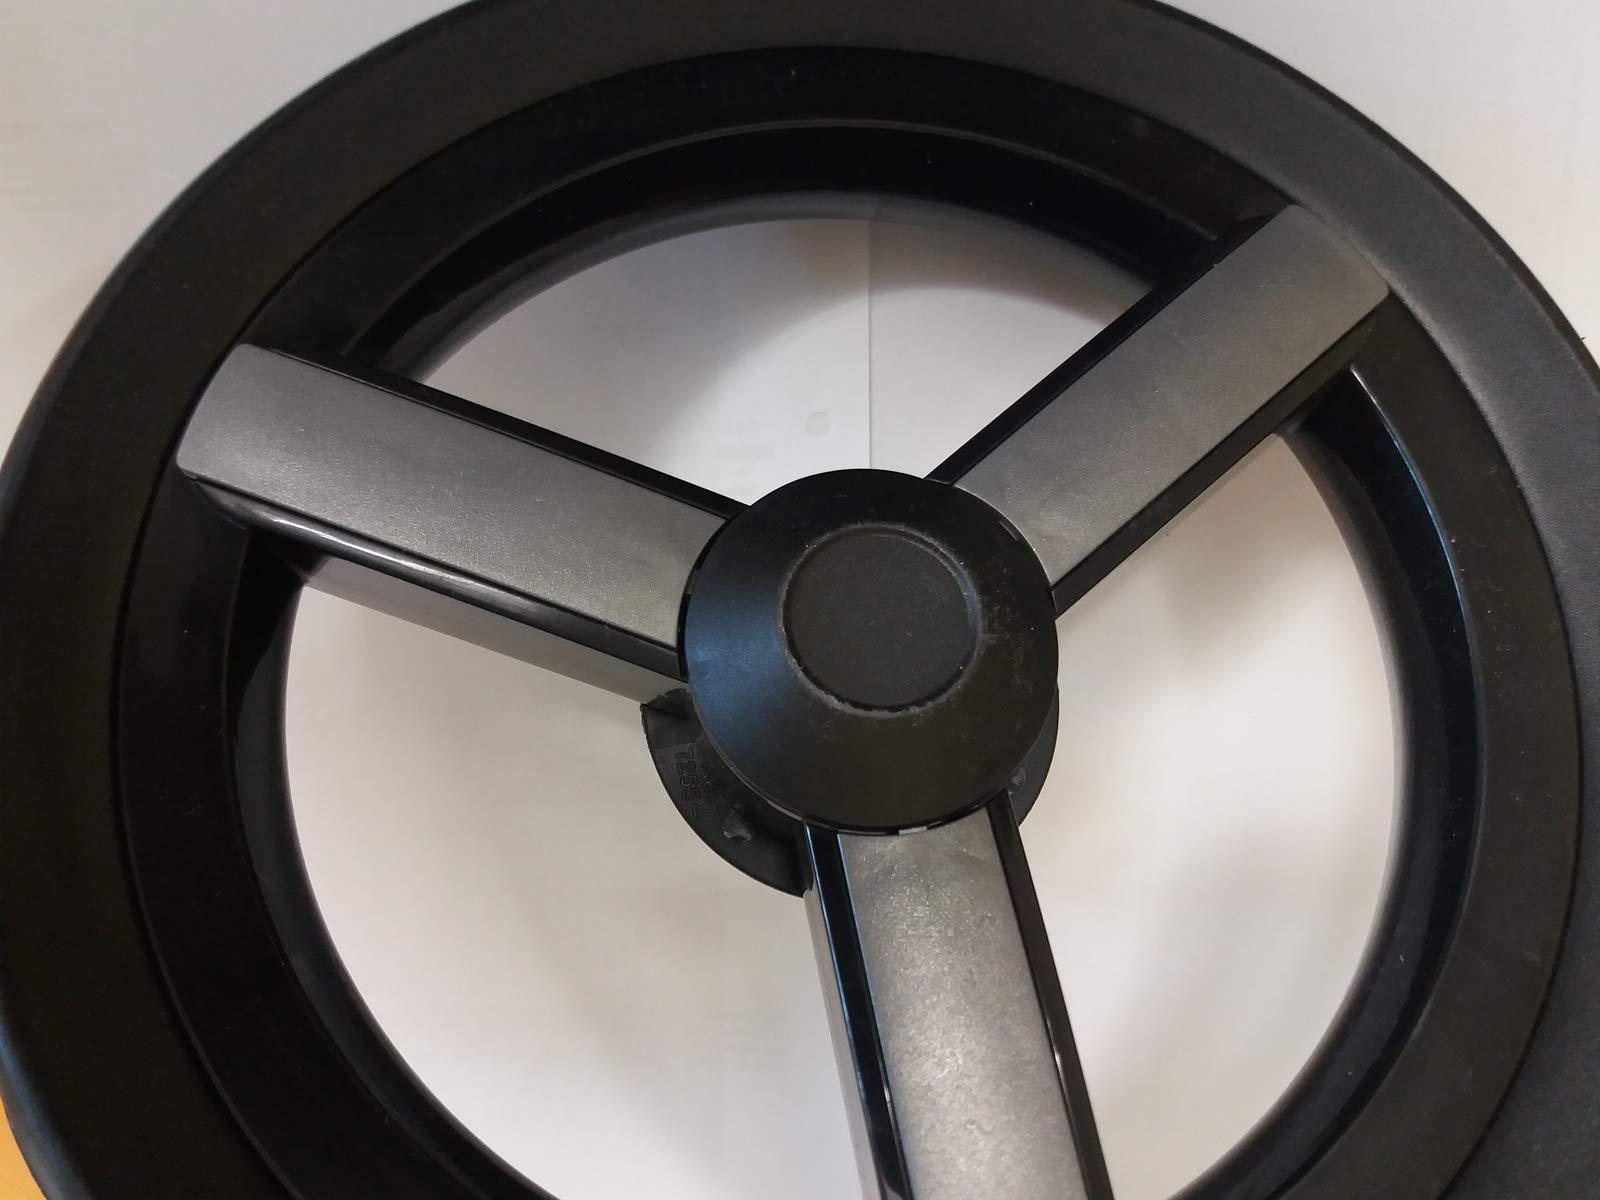 Peg Perego Ypsi Rear Wheel Replacement Peg Perego  1